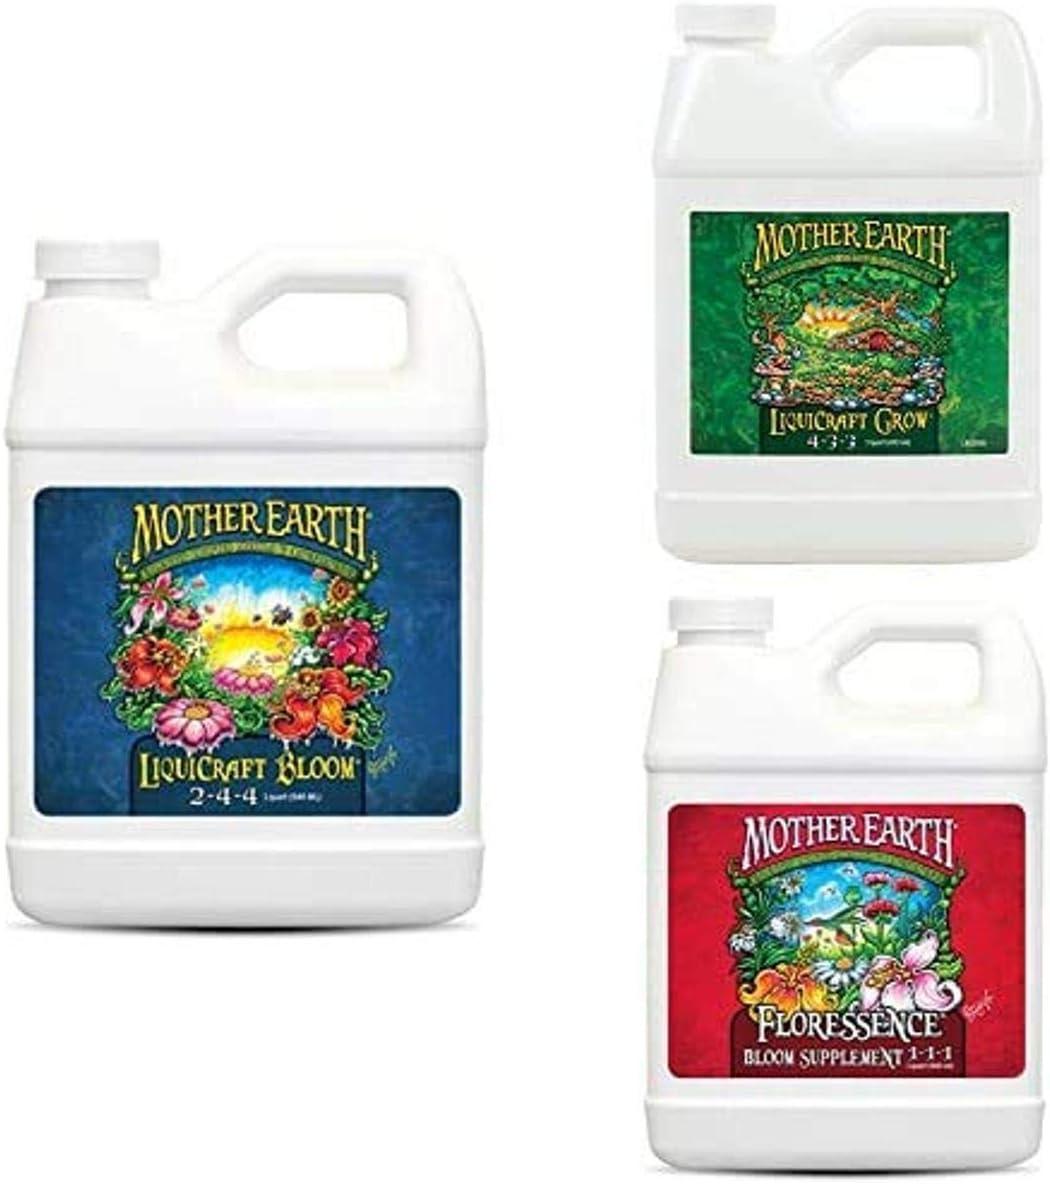 Mother Earth HGC733936 LiquiCraft Bloom 2-4-4 Liquid Fertilizer, Natural with LiquiCraft Grow 4-3-3 Liquid Fertilizer and Floressence Bloom Supplement 1-1-1 Liquid Fertilizer